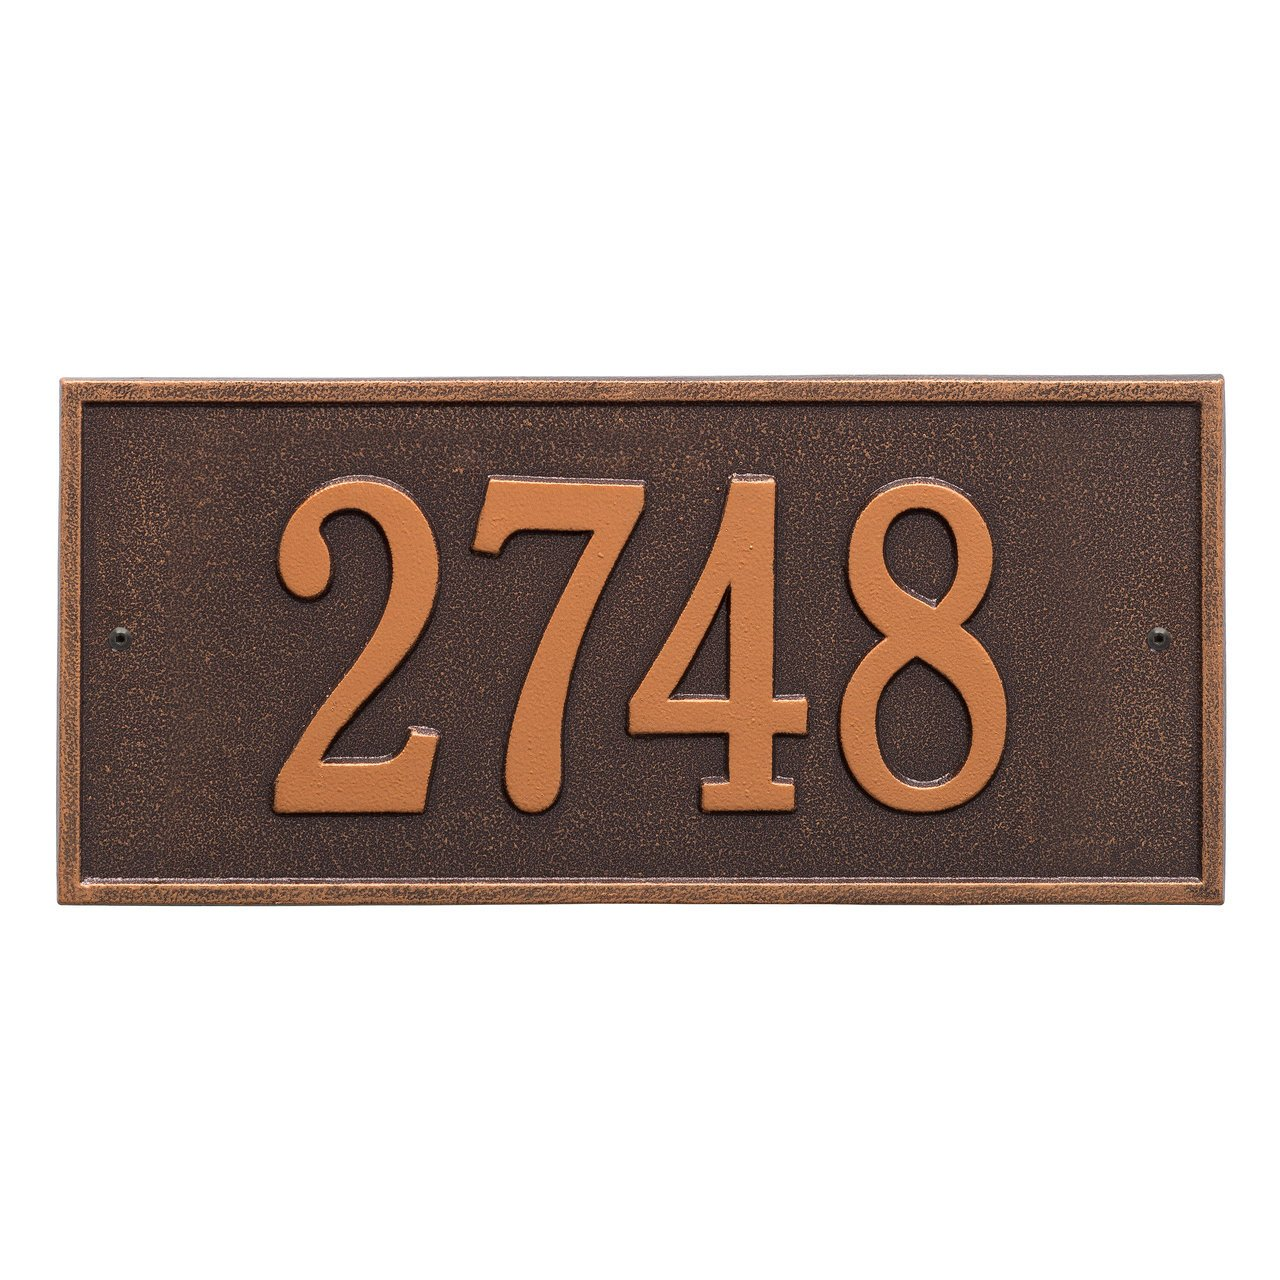 Custom Hartford 1 Line Address Plaque 16 W x 7.25H